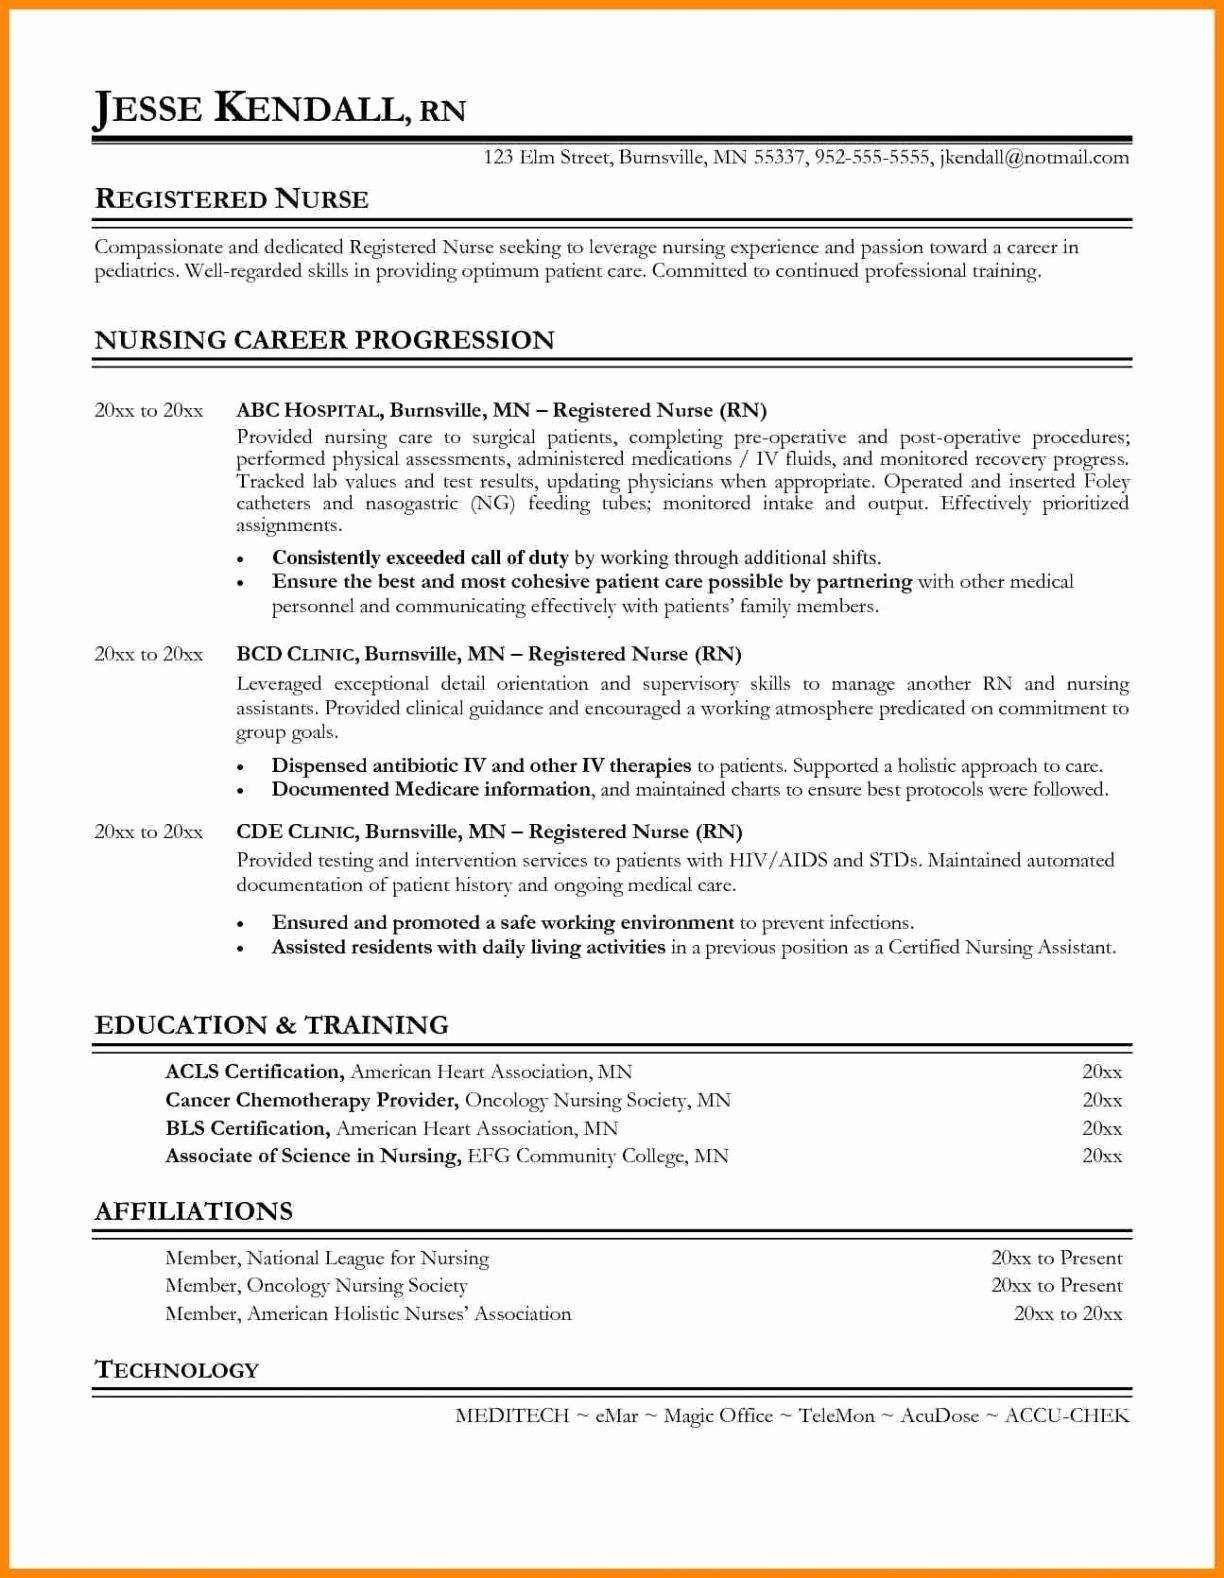 Things To Highlight On A Nurse Resume New Grad Registered Nurse Resume Nursing Resume Template Rn Resume